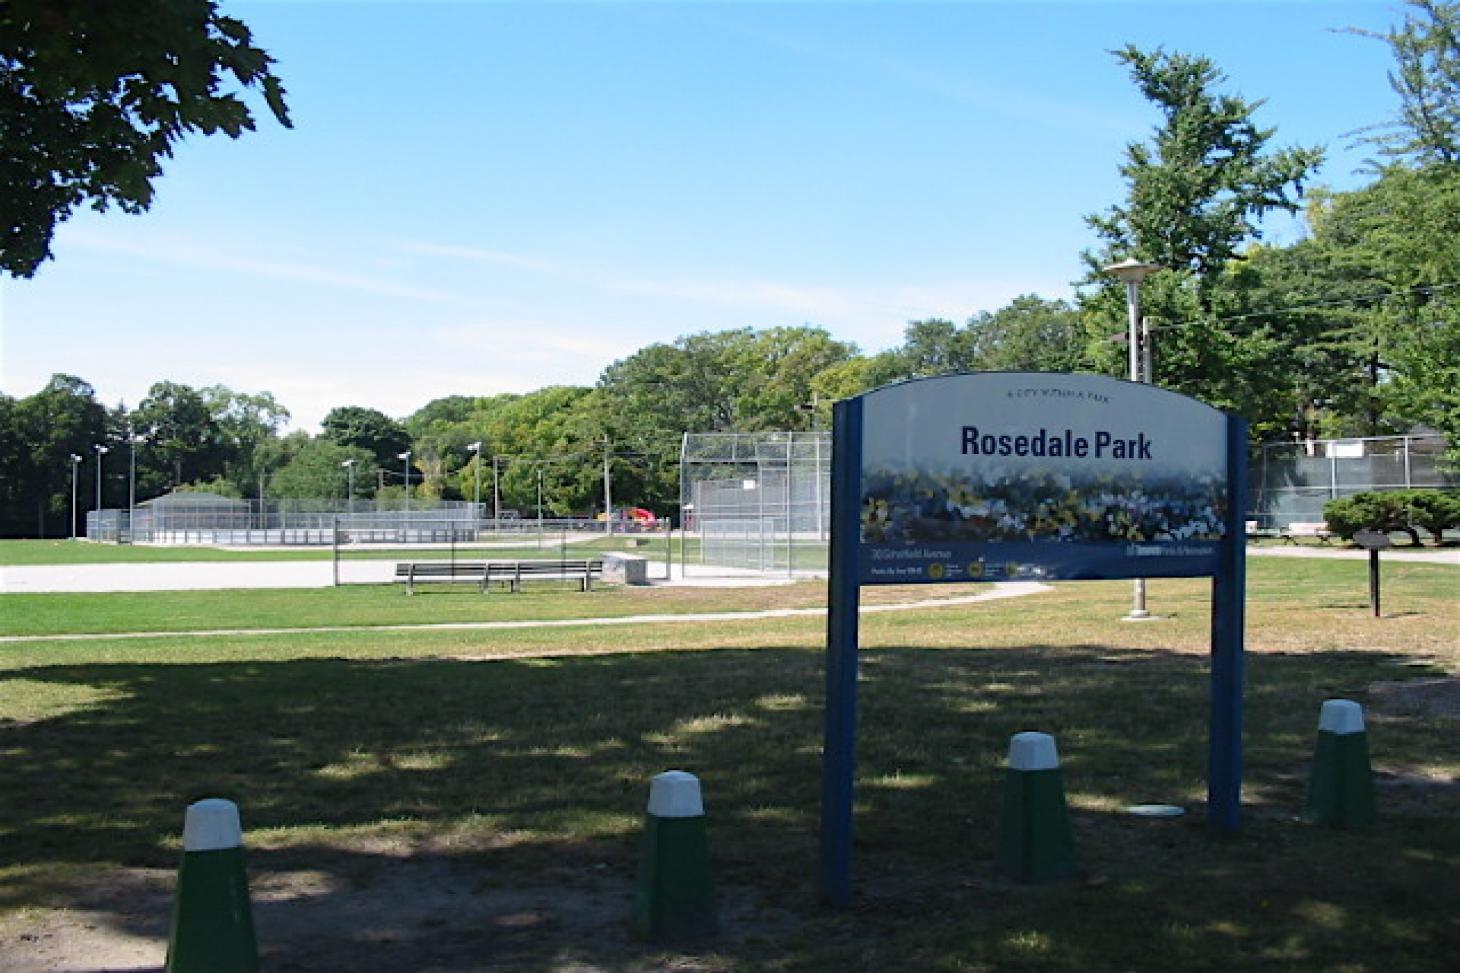 Rosedale Park Outdoor | Hard (macadam) tennis court